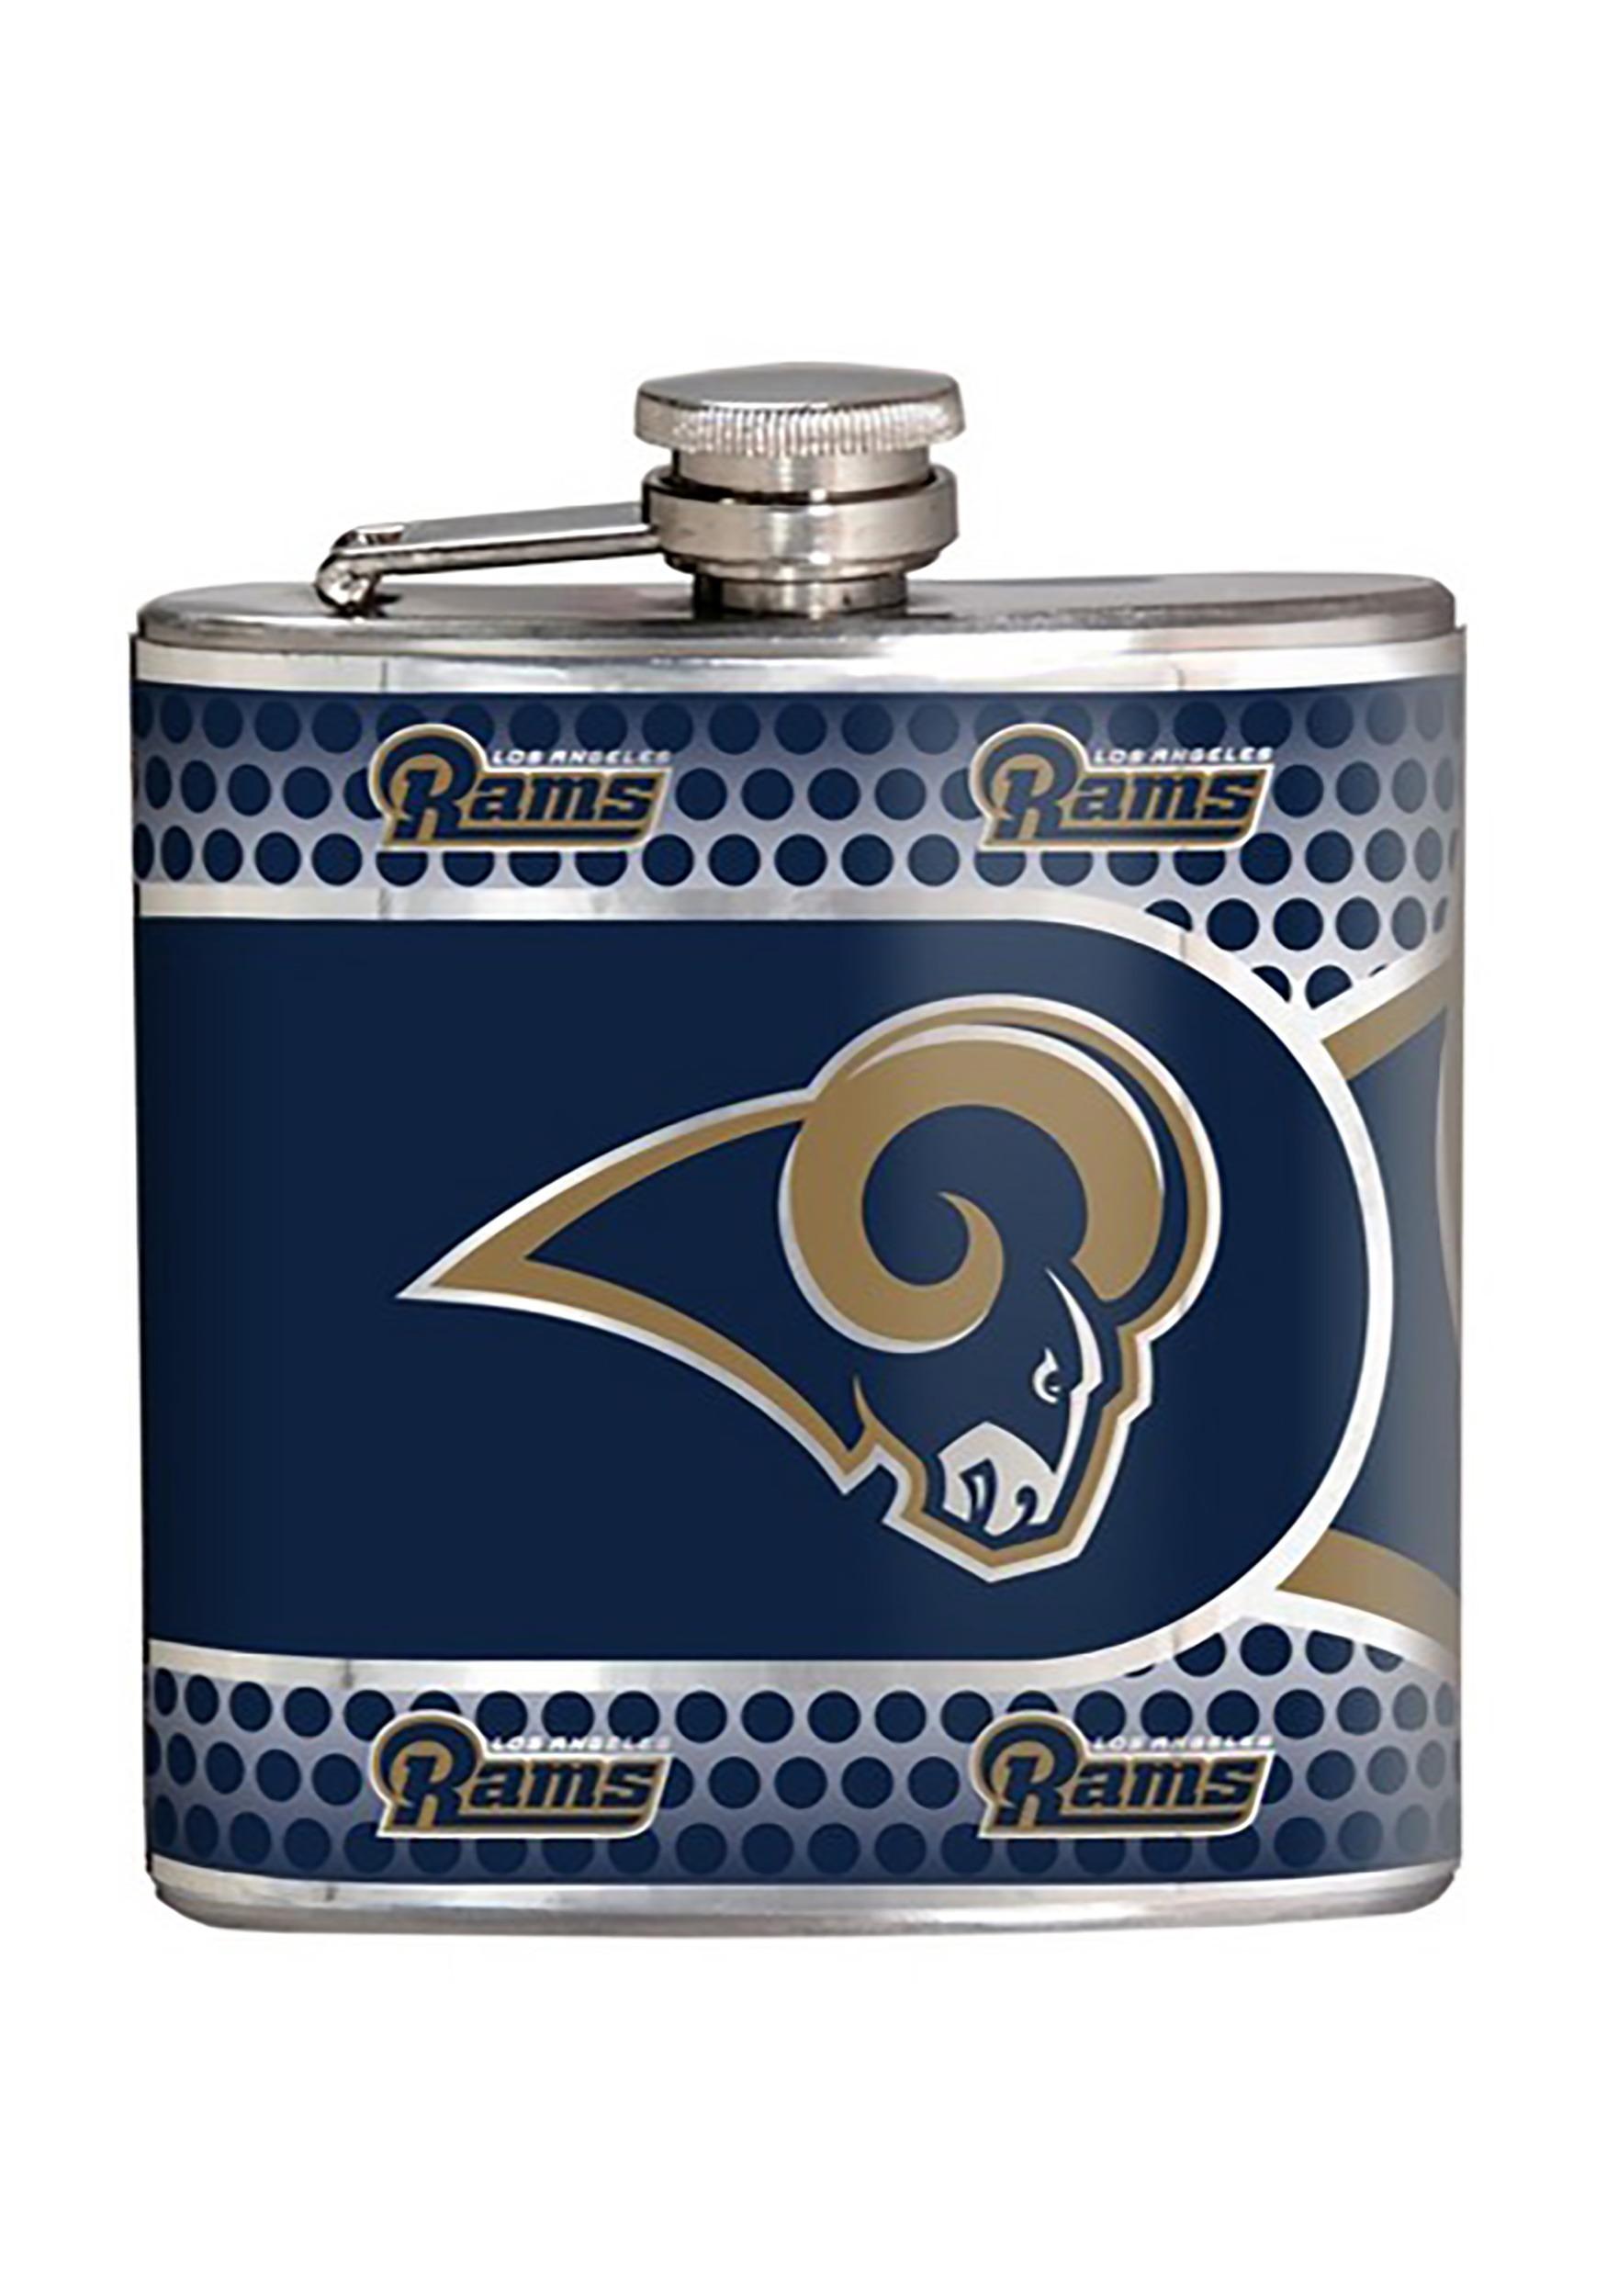 NFL Los Angeles Rams 6 oz. Stainless Steel Flask w/ Metallic Graphics